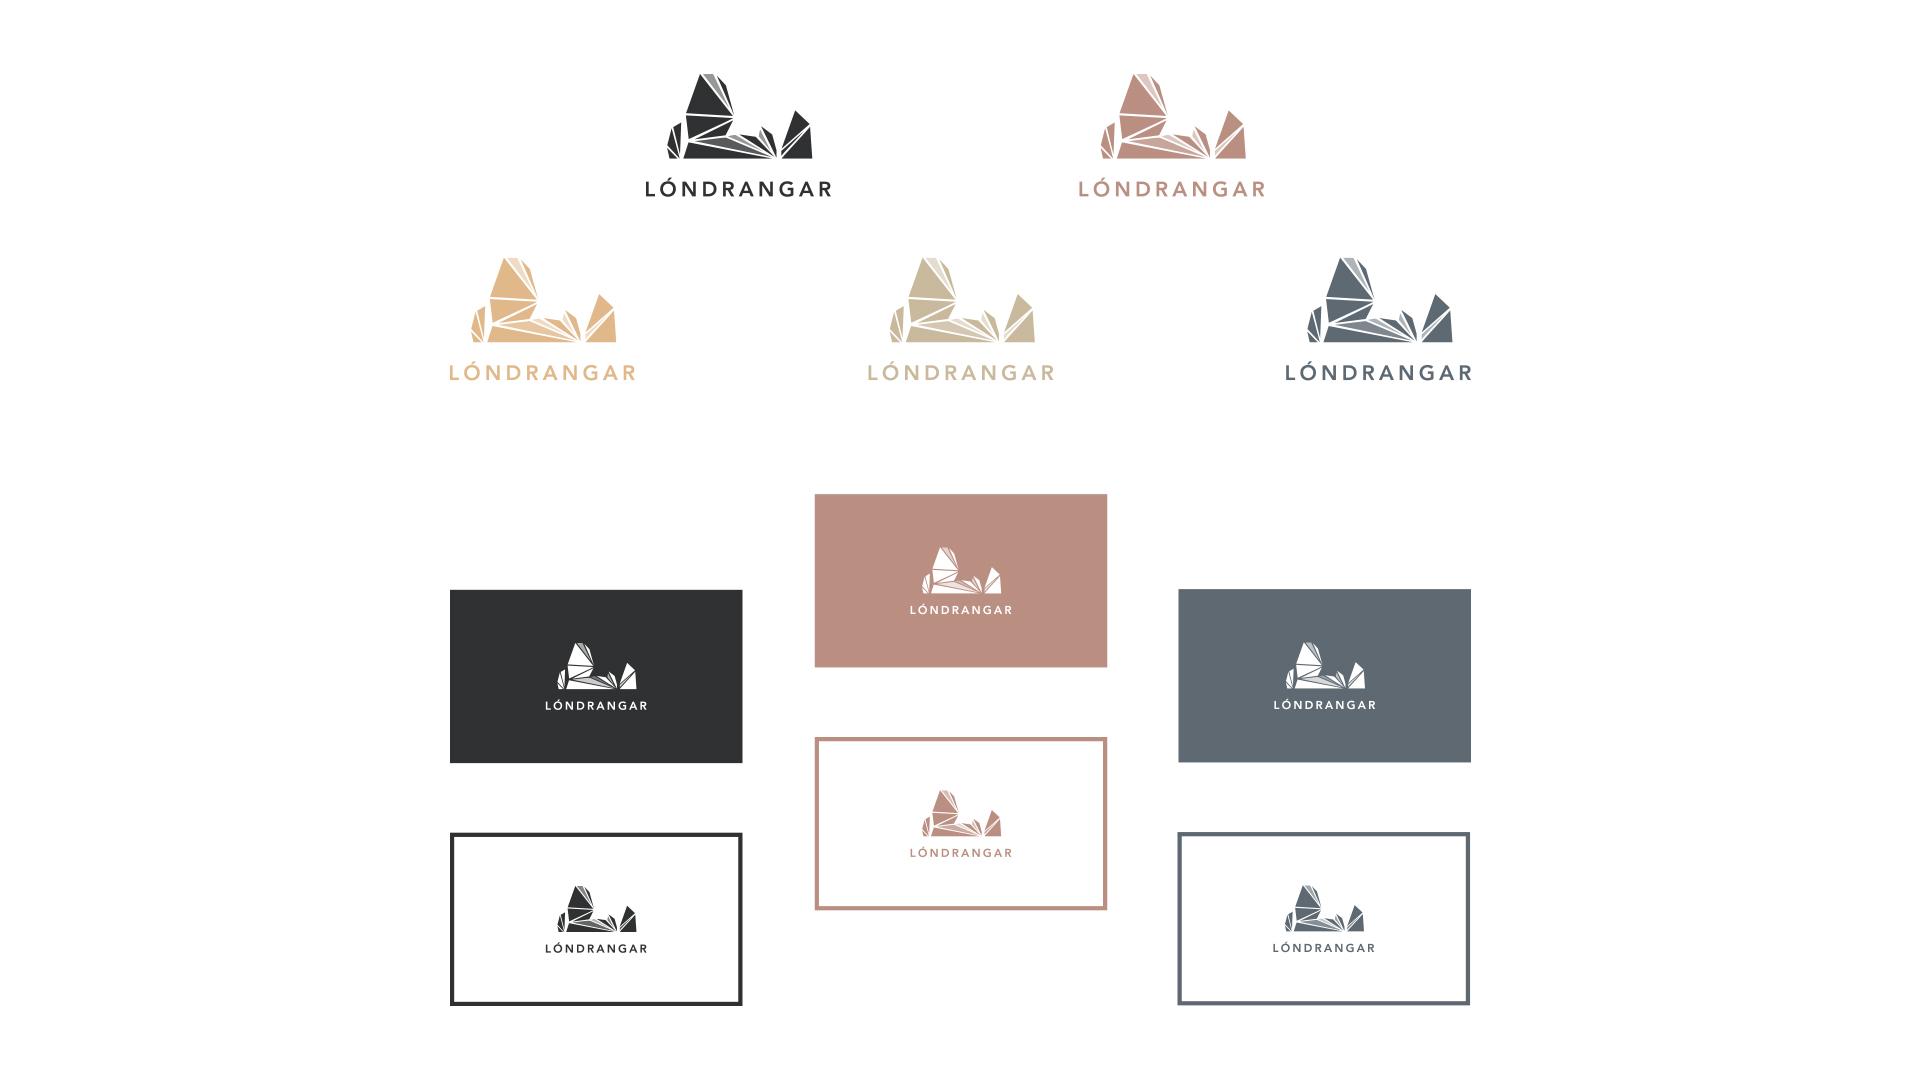 londrsngsr_logo_cards